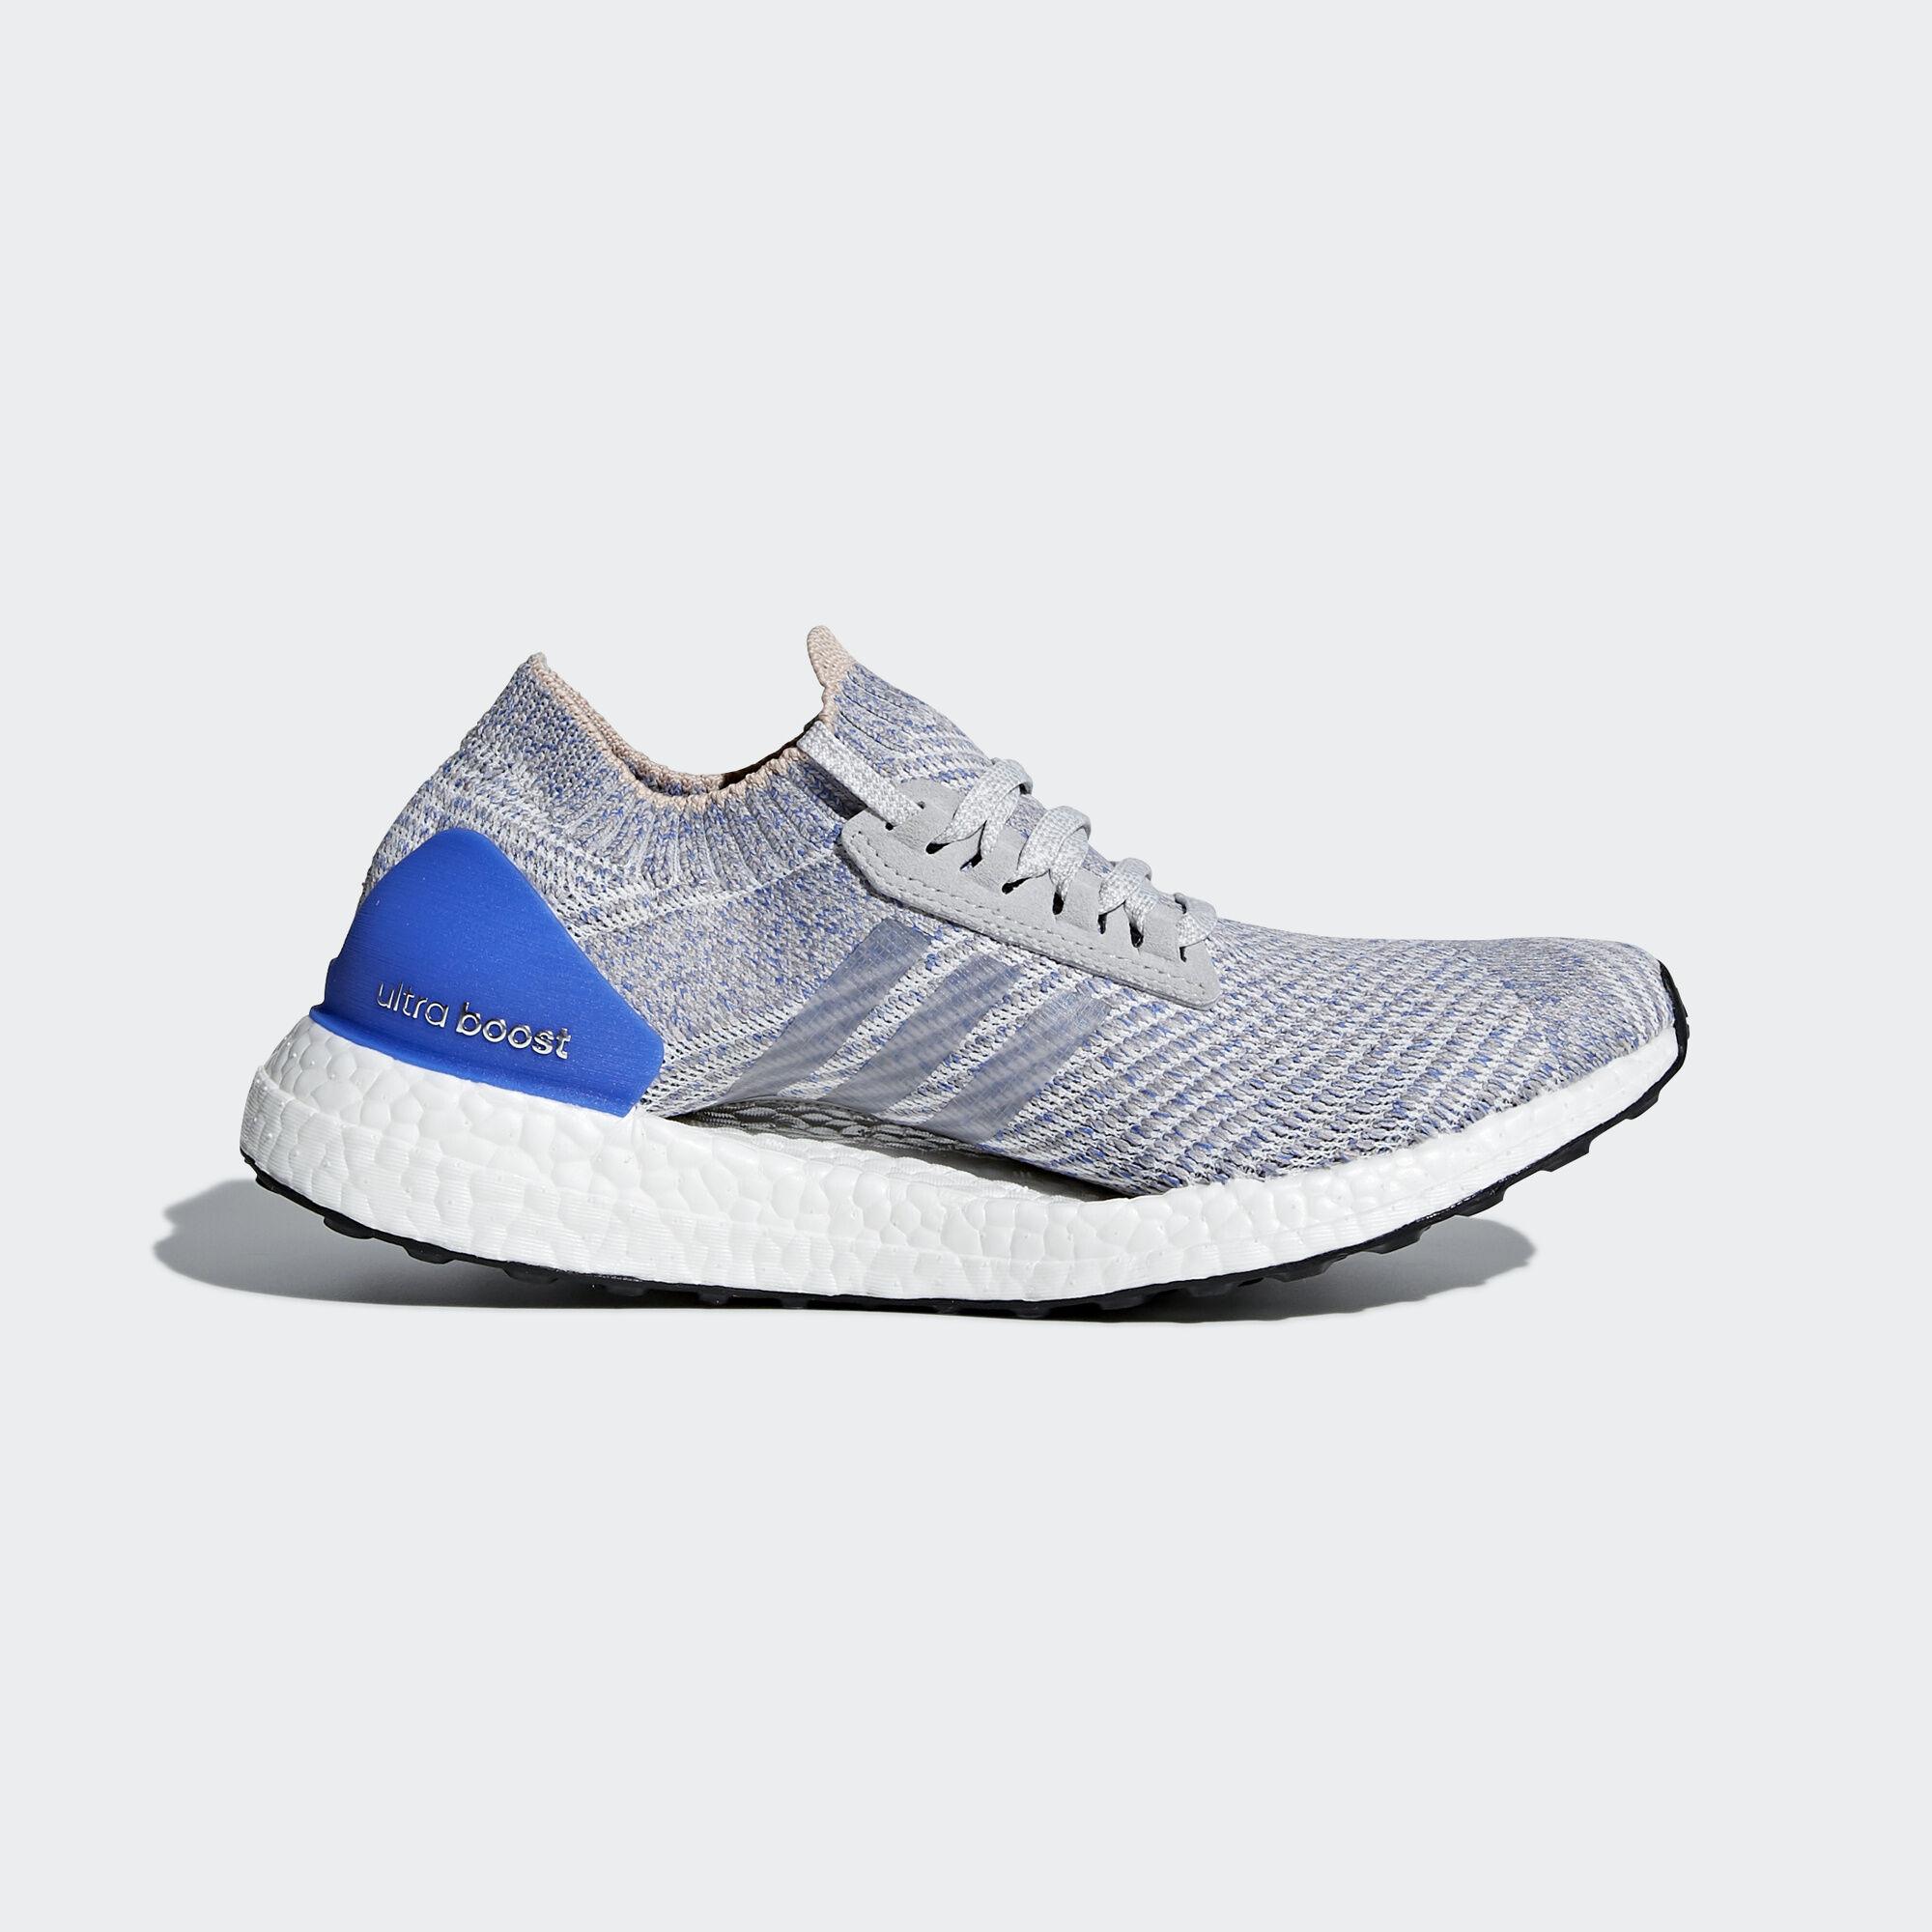 632c477aec7f adidas - Ultraboost X Shoes Grey Two Grey Two Hi-Res Blue BB6155. Women  Running